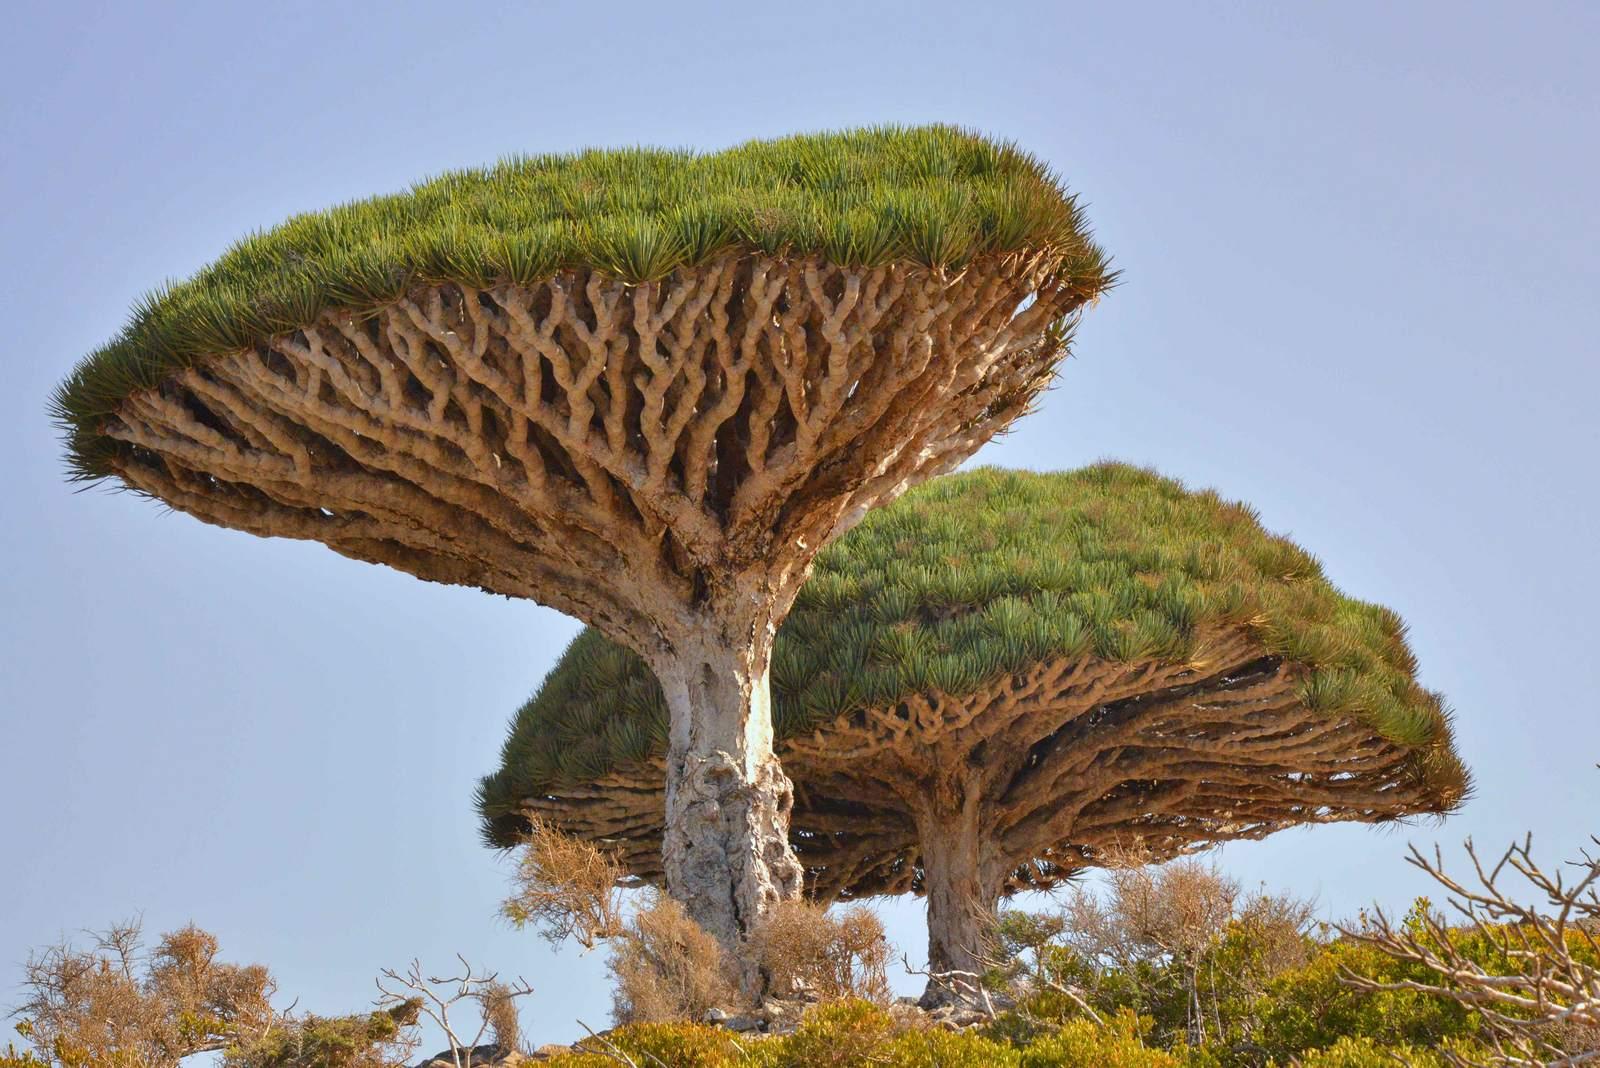 socotra6 Dragons Blood Tree at Socotra Island, Yemen